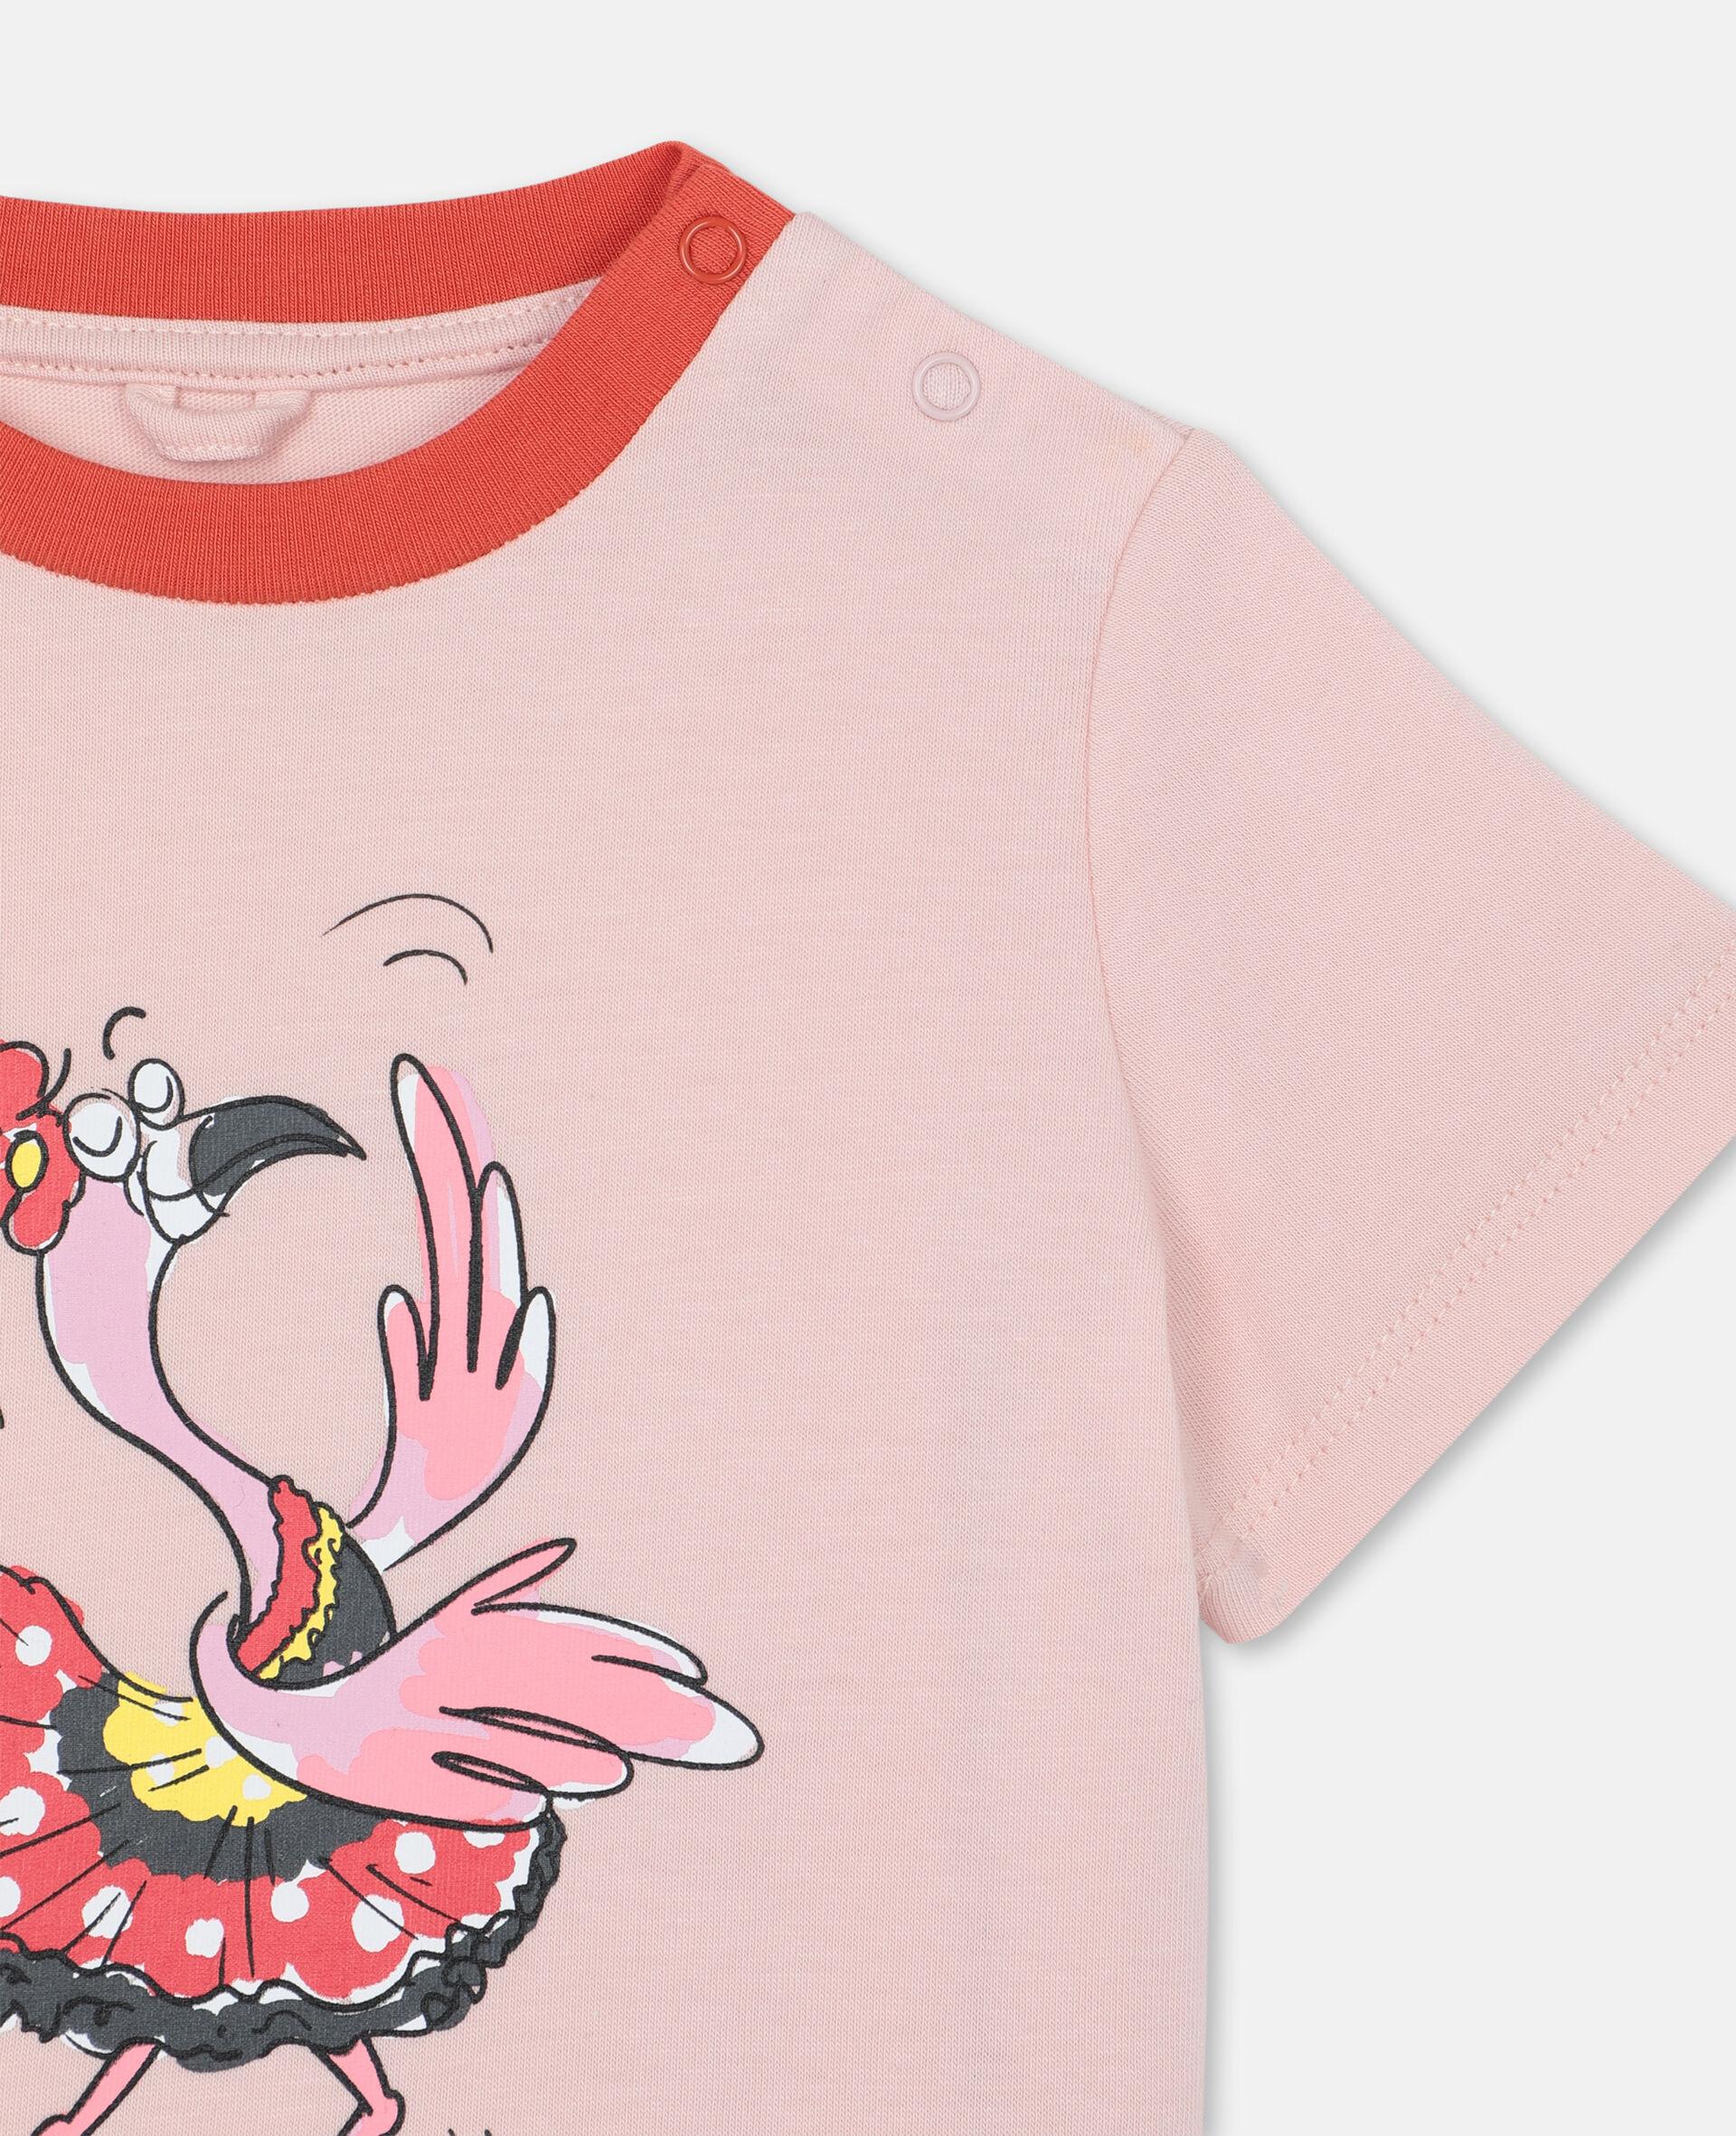 Dancing Flamingo Cotton T-shirt-Pink-large image number 1